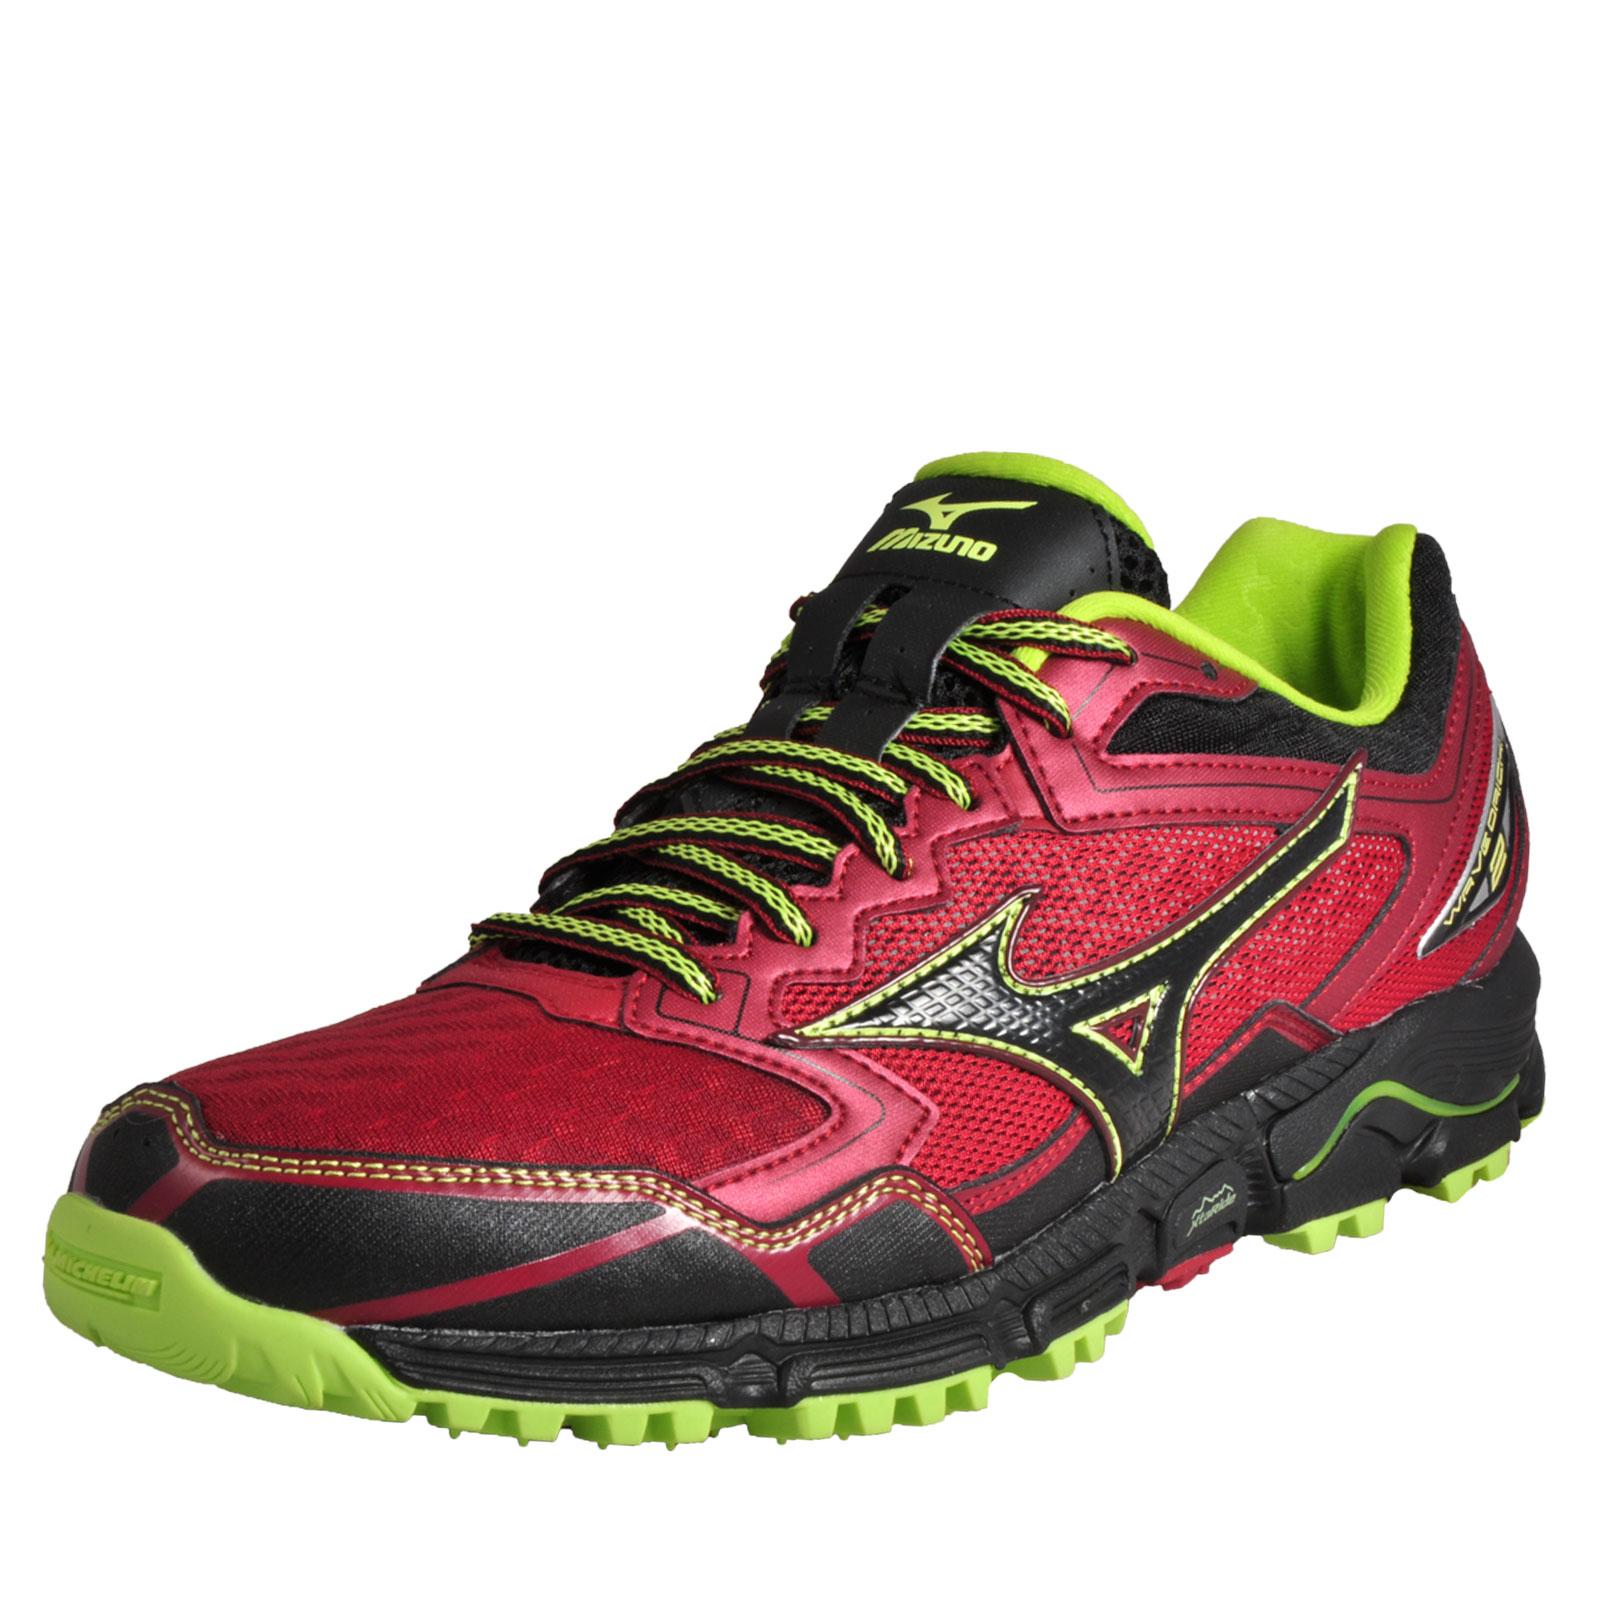 e3564098f0a6 Details about Mizuno Wave Daichi 2 Mens All Terrain Trail Off Road Running  Shoes